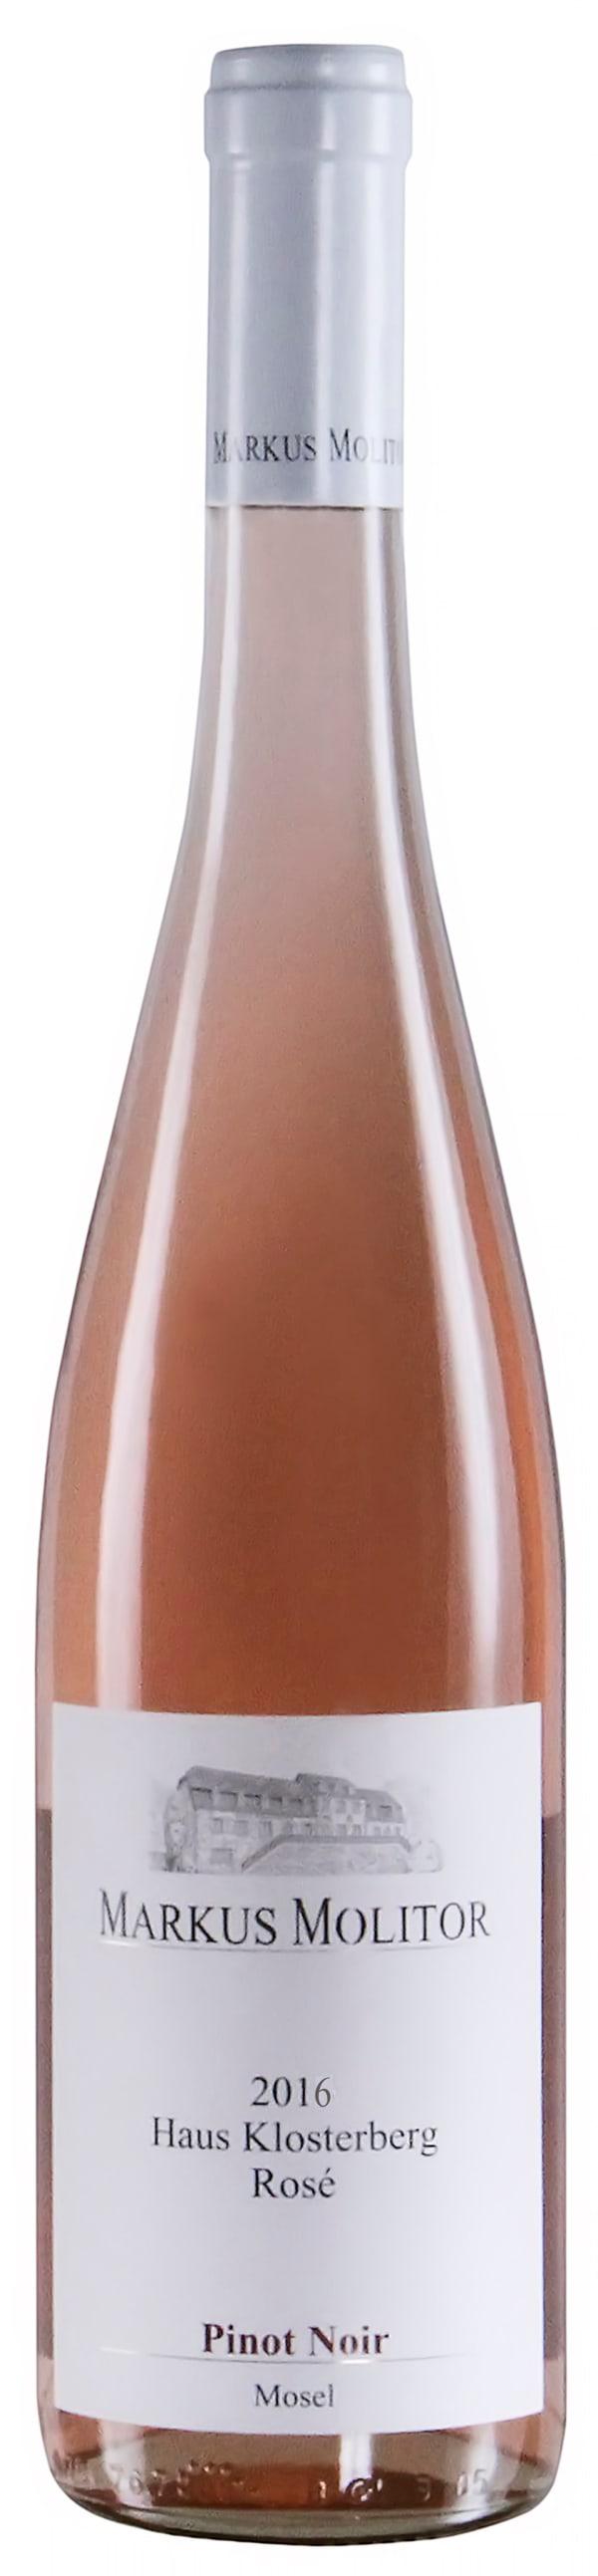 Markus Molitor Haus Klosterberg Pinot Noir Rosé 2016